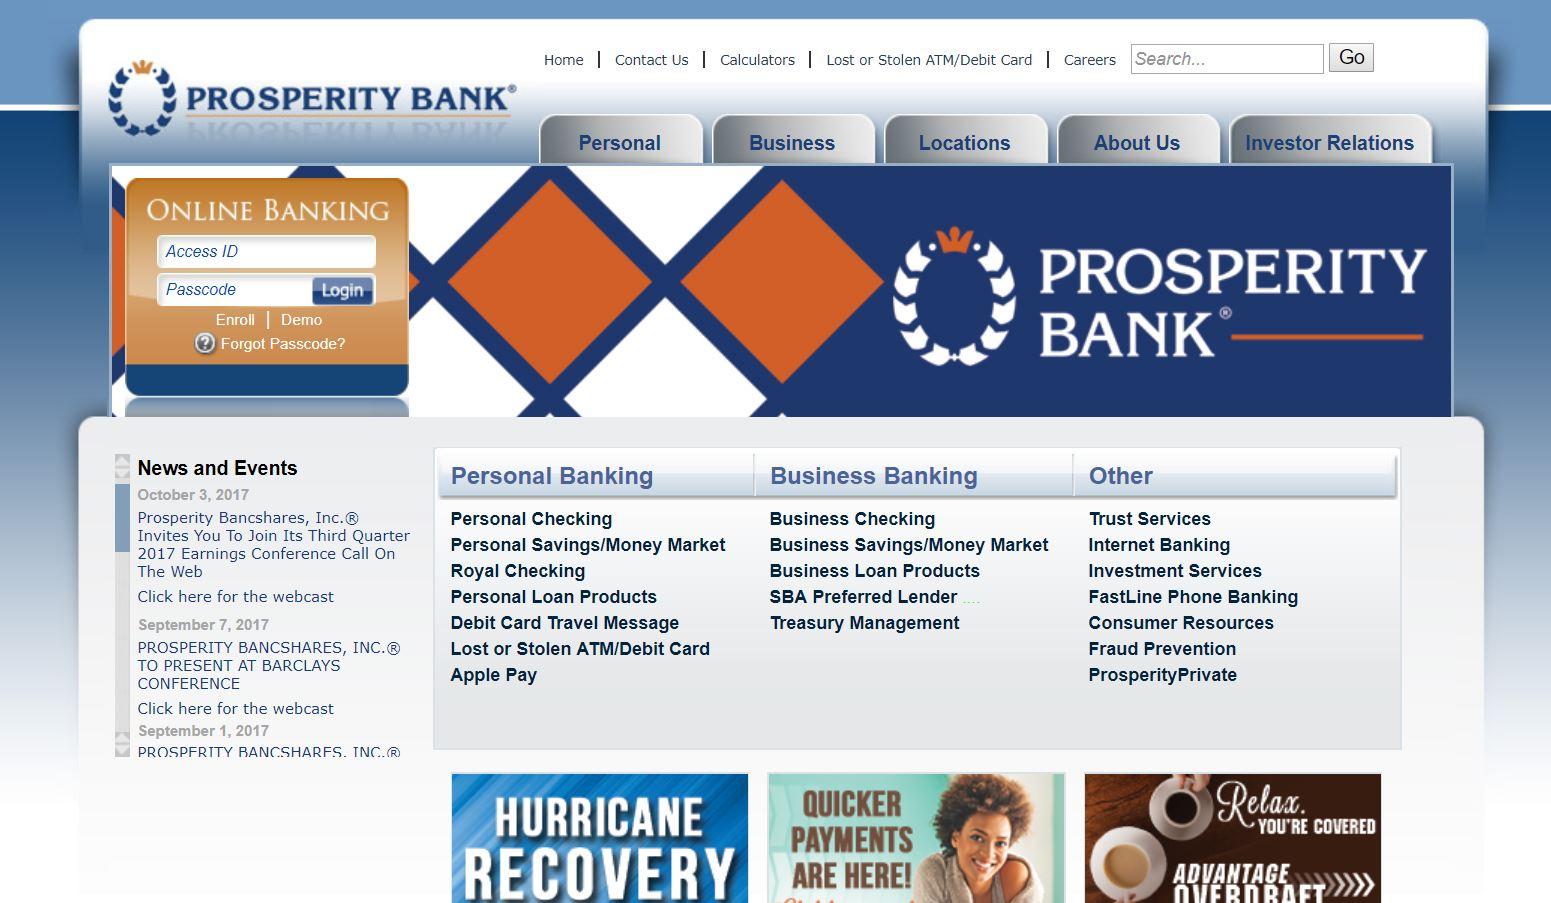 prprosperity bank online banking